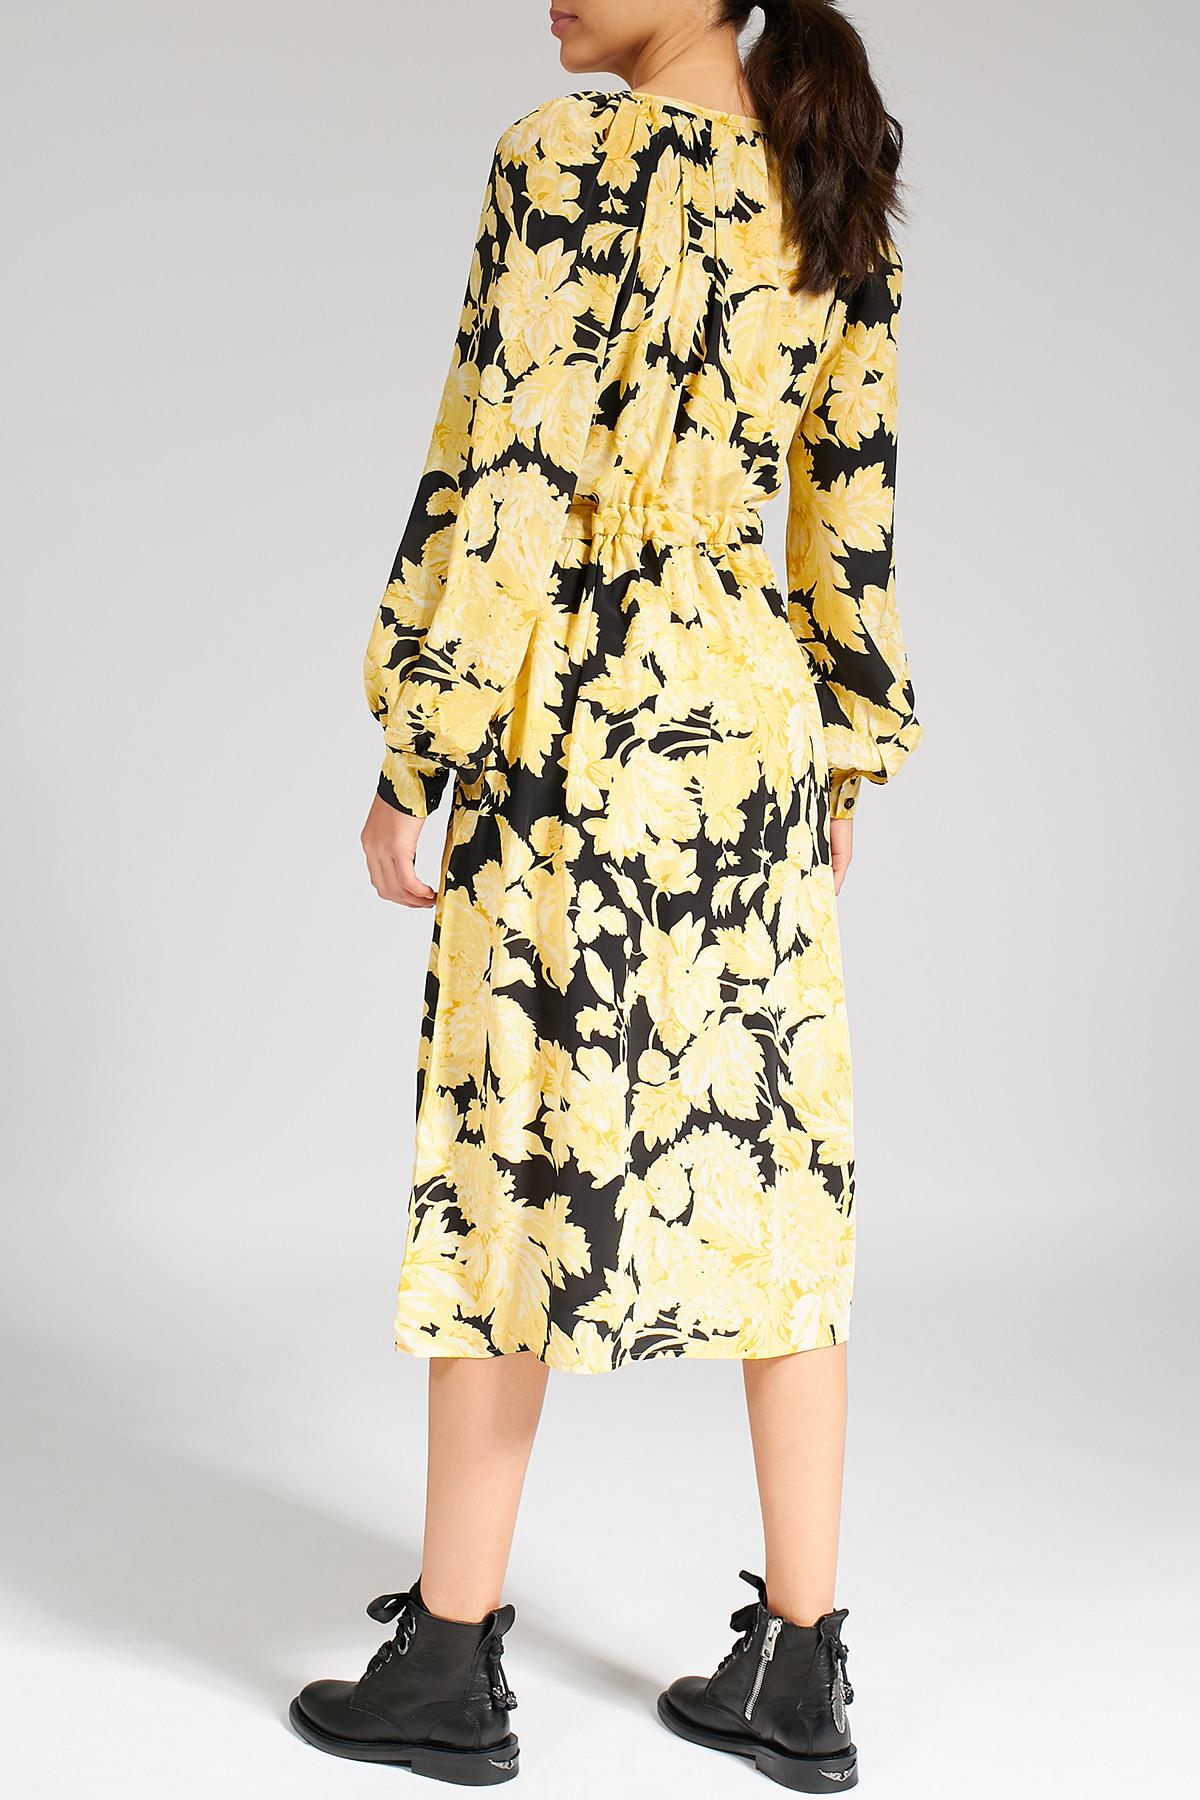 Gemustertes Kleid Lydia Aus Seide  Stine Goya